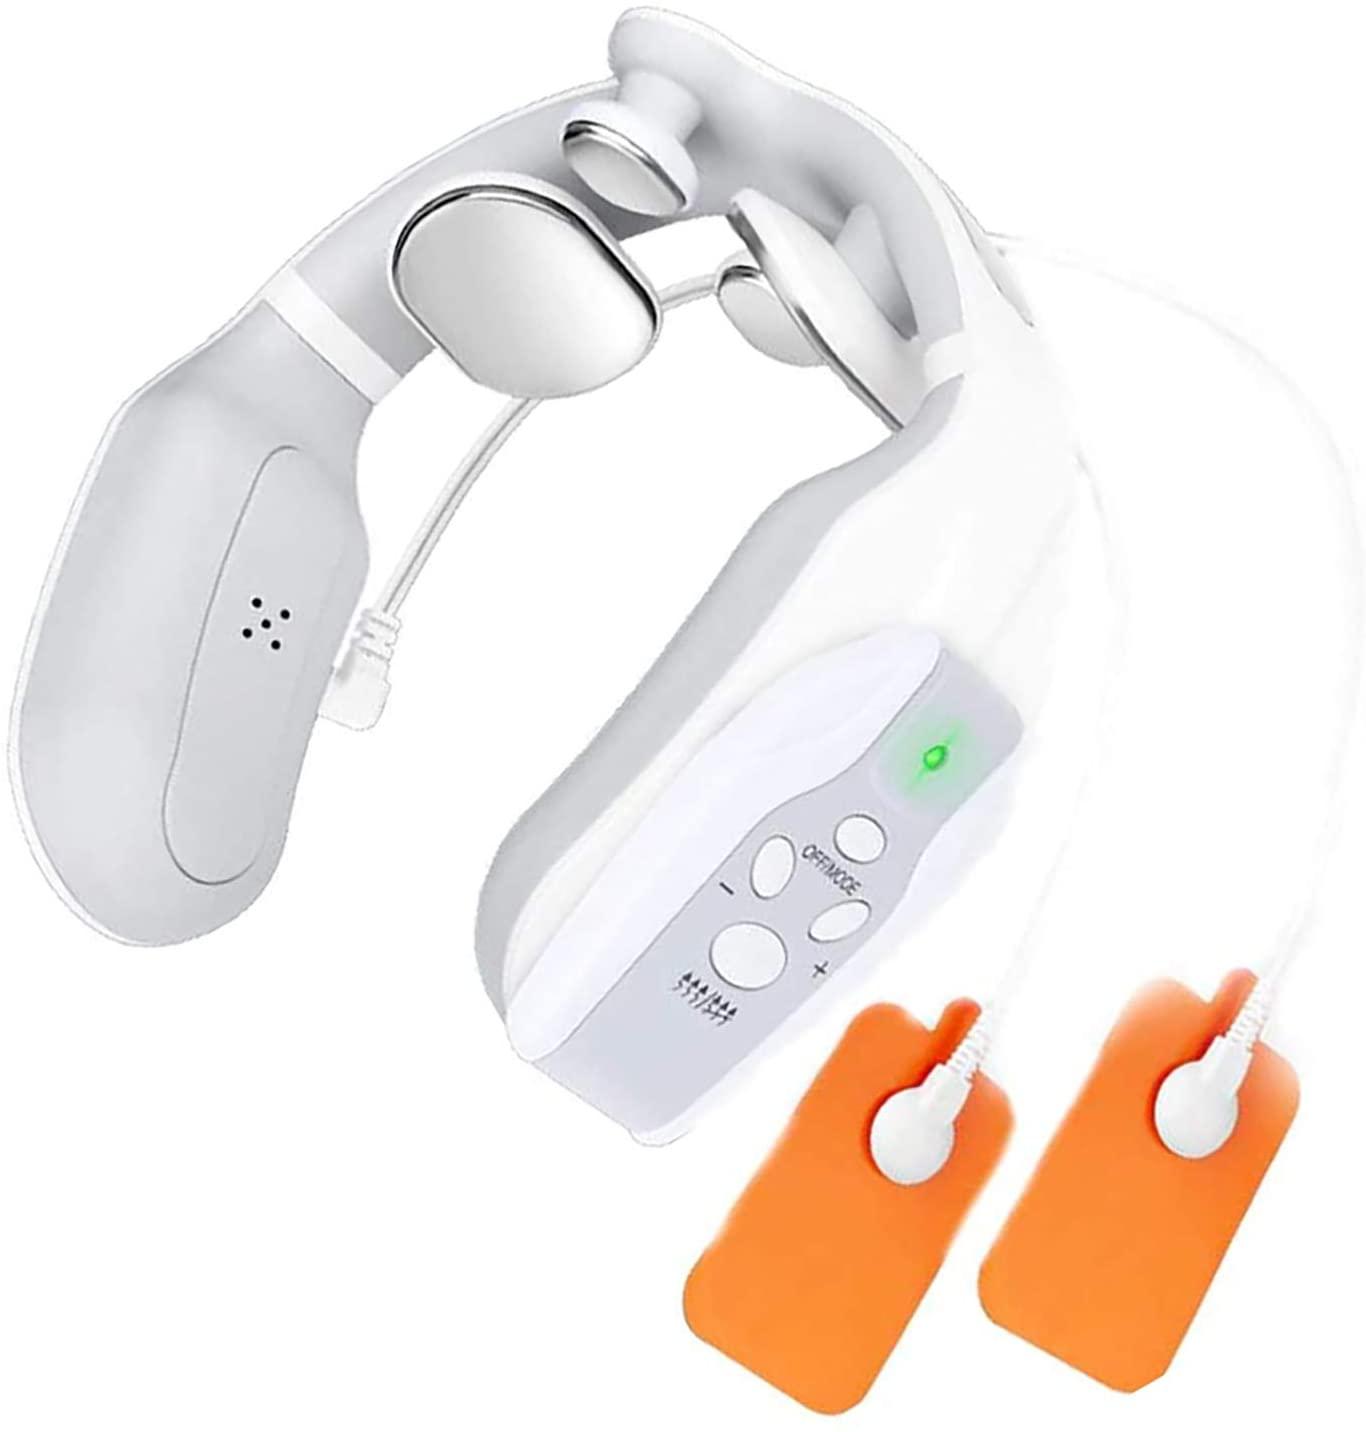 JAOCDOEN Neckology, Intelligent Neck Massage with Heat Portable Wireless Massage Equipment with 3 Modes for Women, Man